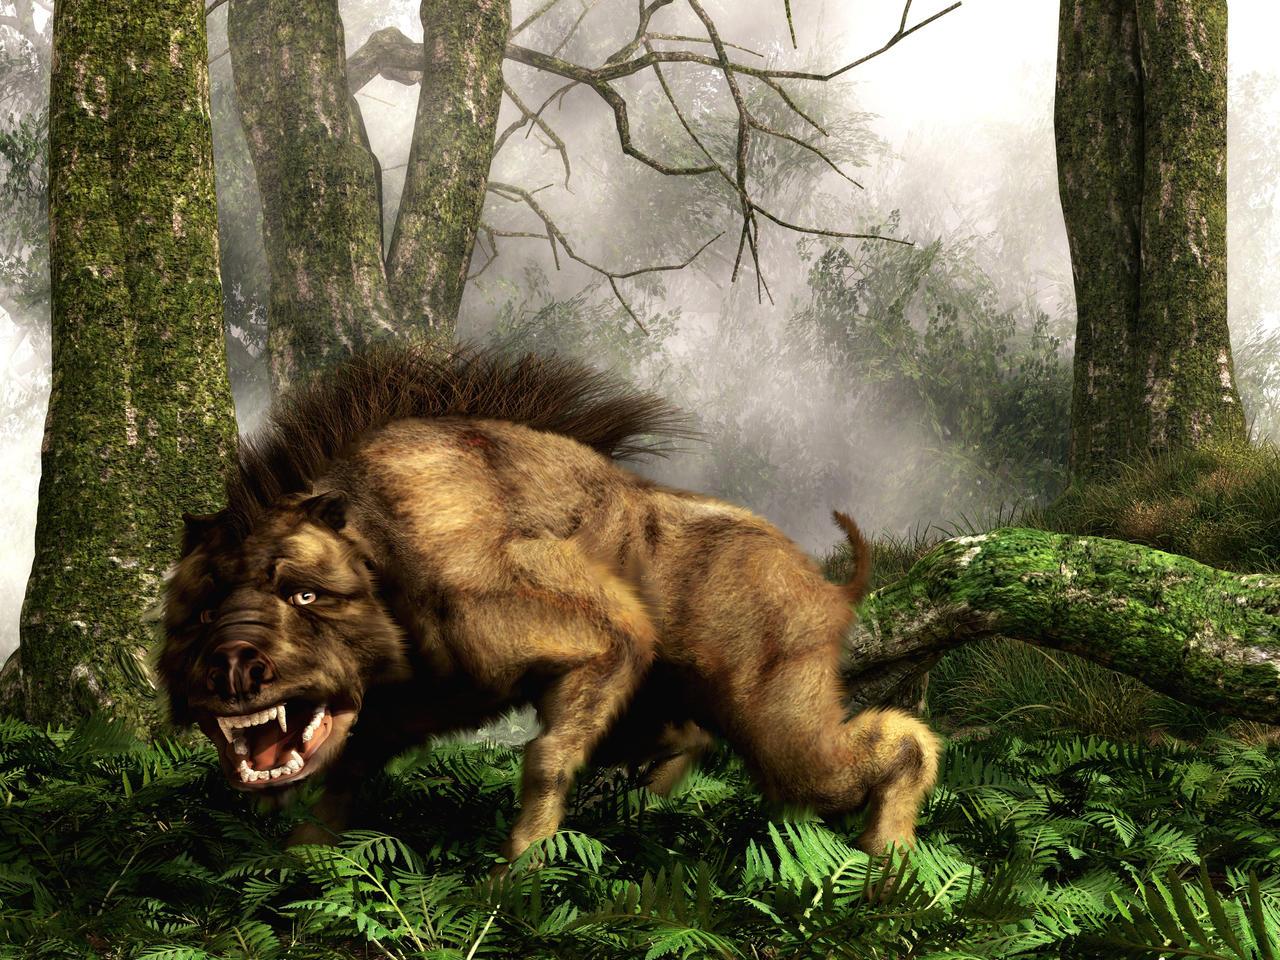 Daeodon, The Terrible Hog